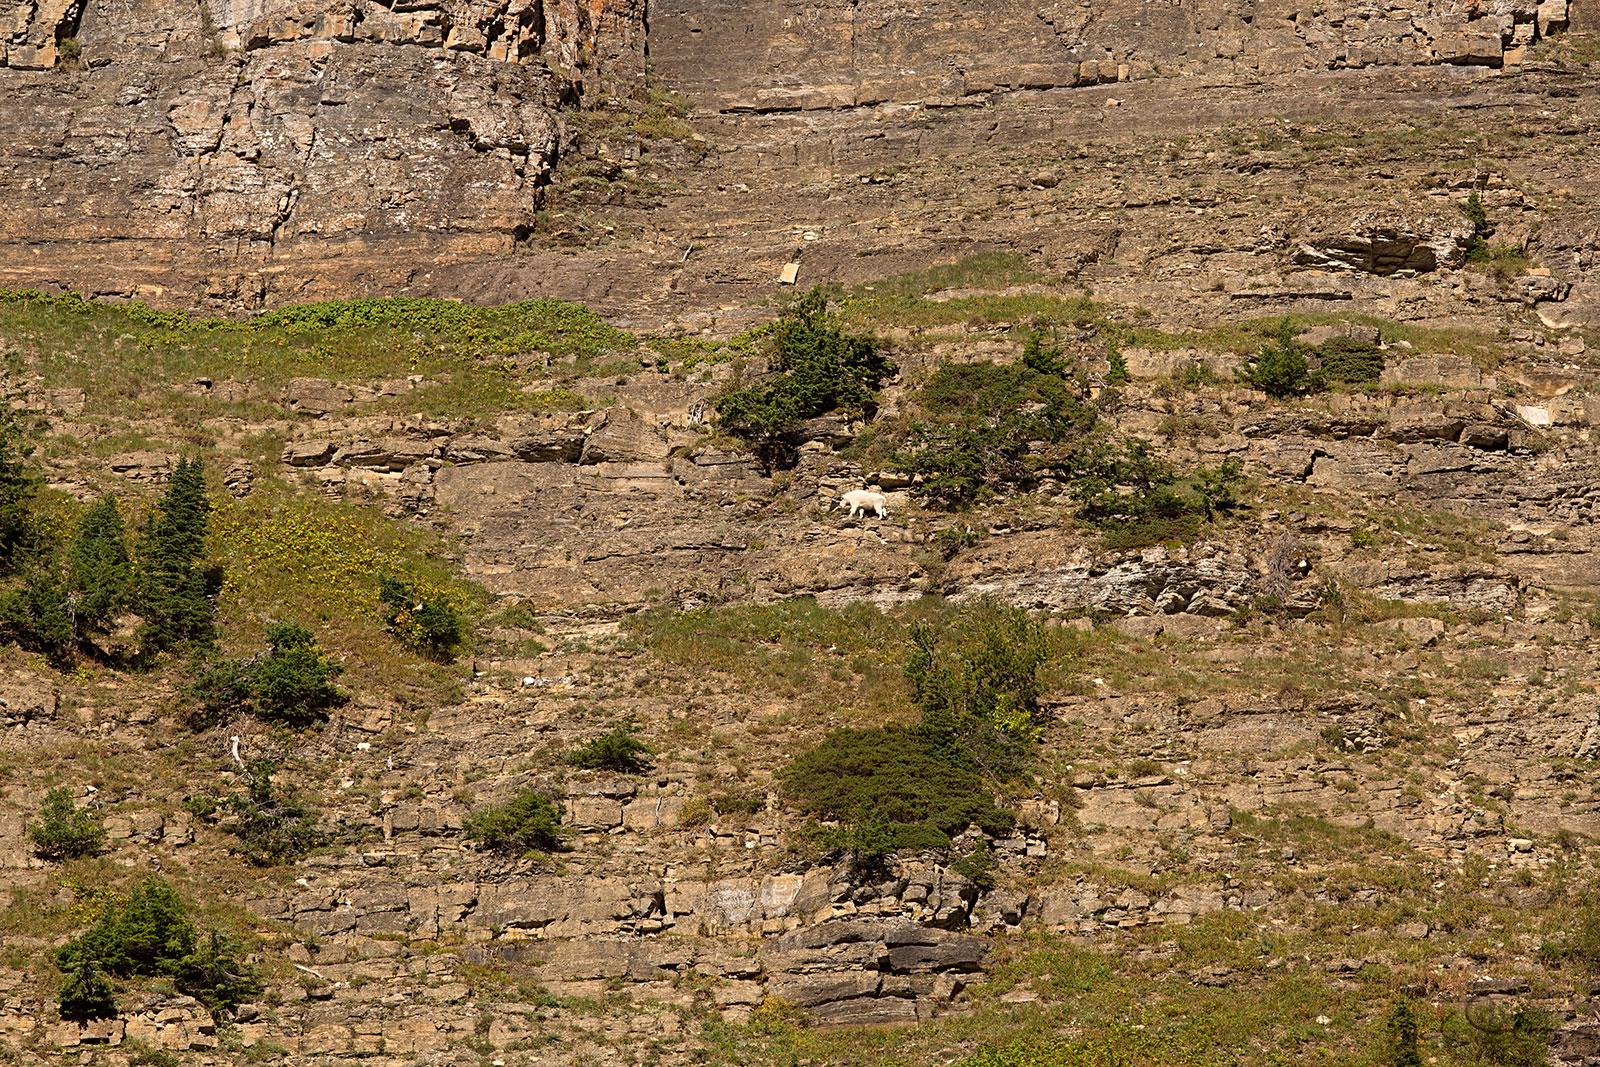 A lone mountain goat saunters along a precipice.